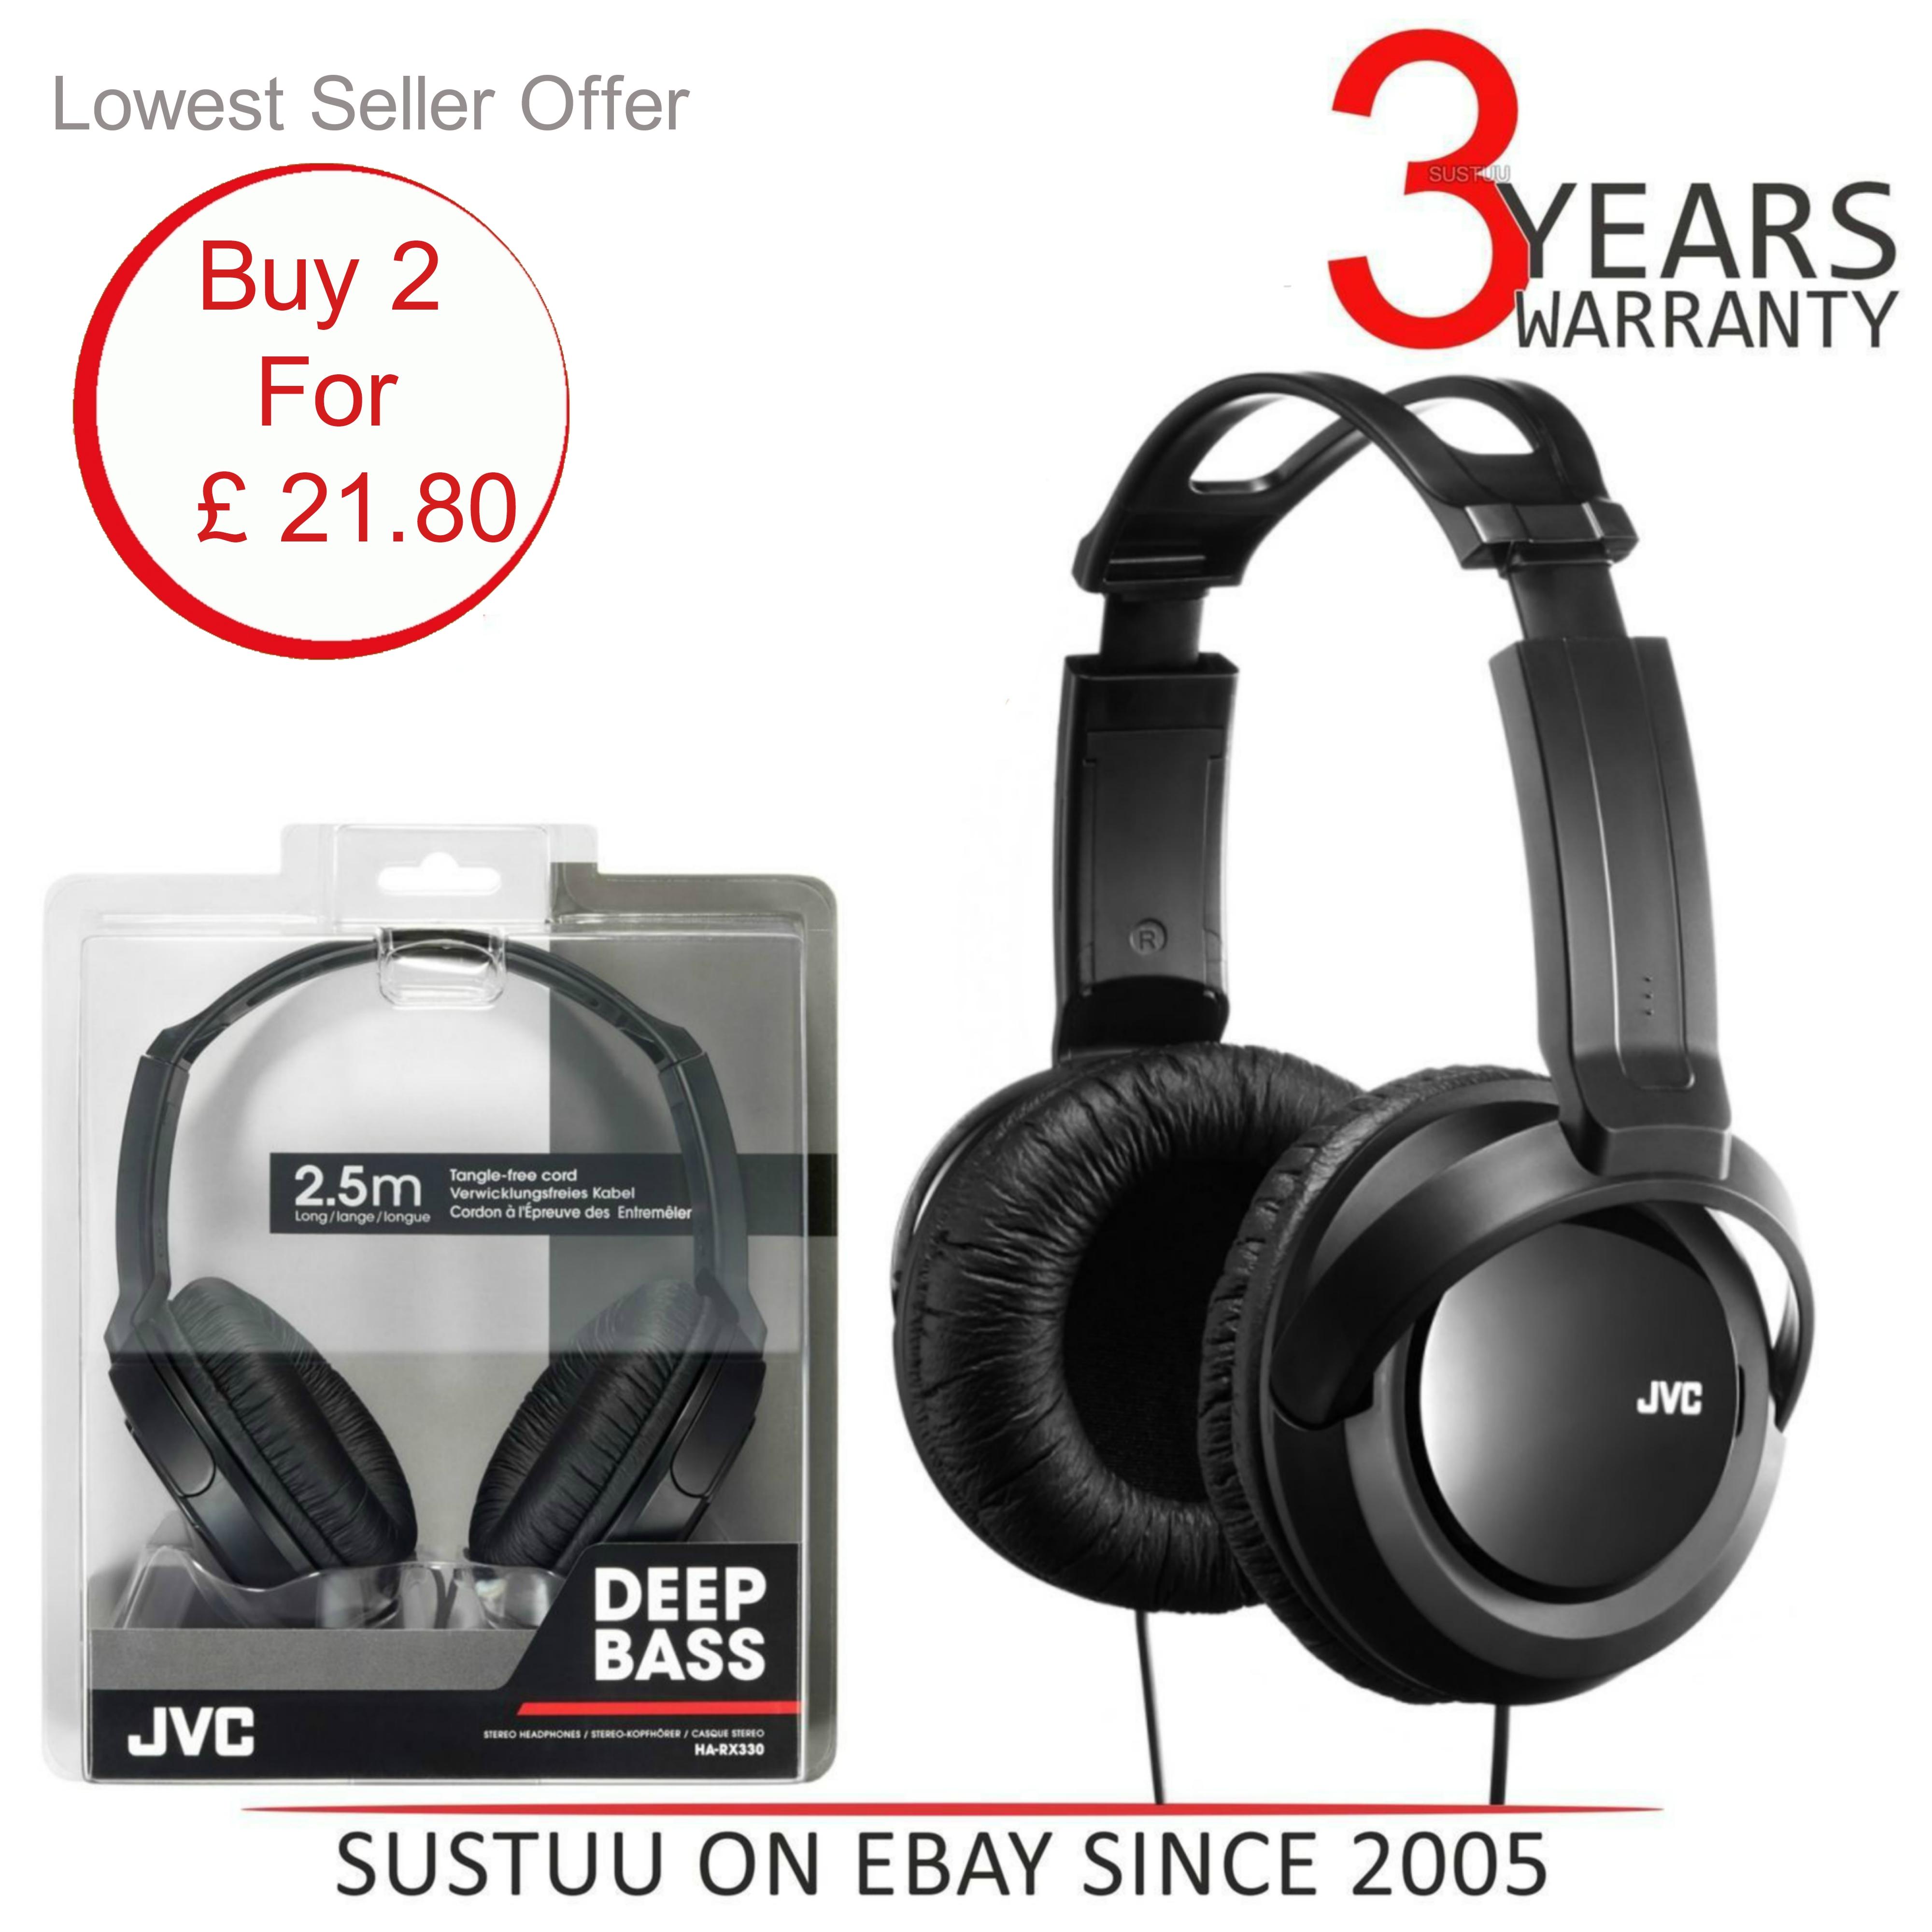 JVC HARX330|Over-Ear DJ Stereo Headphone|Deep Bass Sound|2.5mCord|Black x 2 Unit